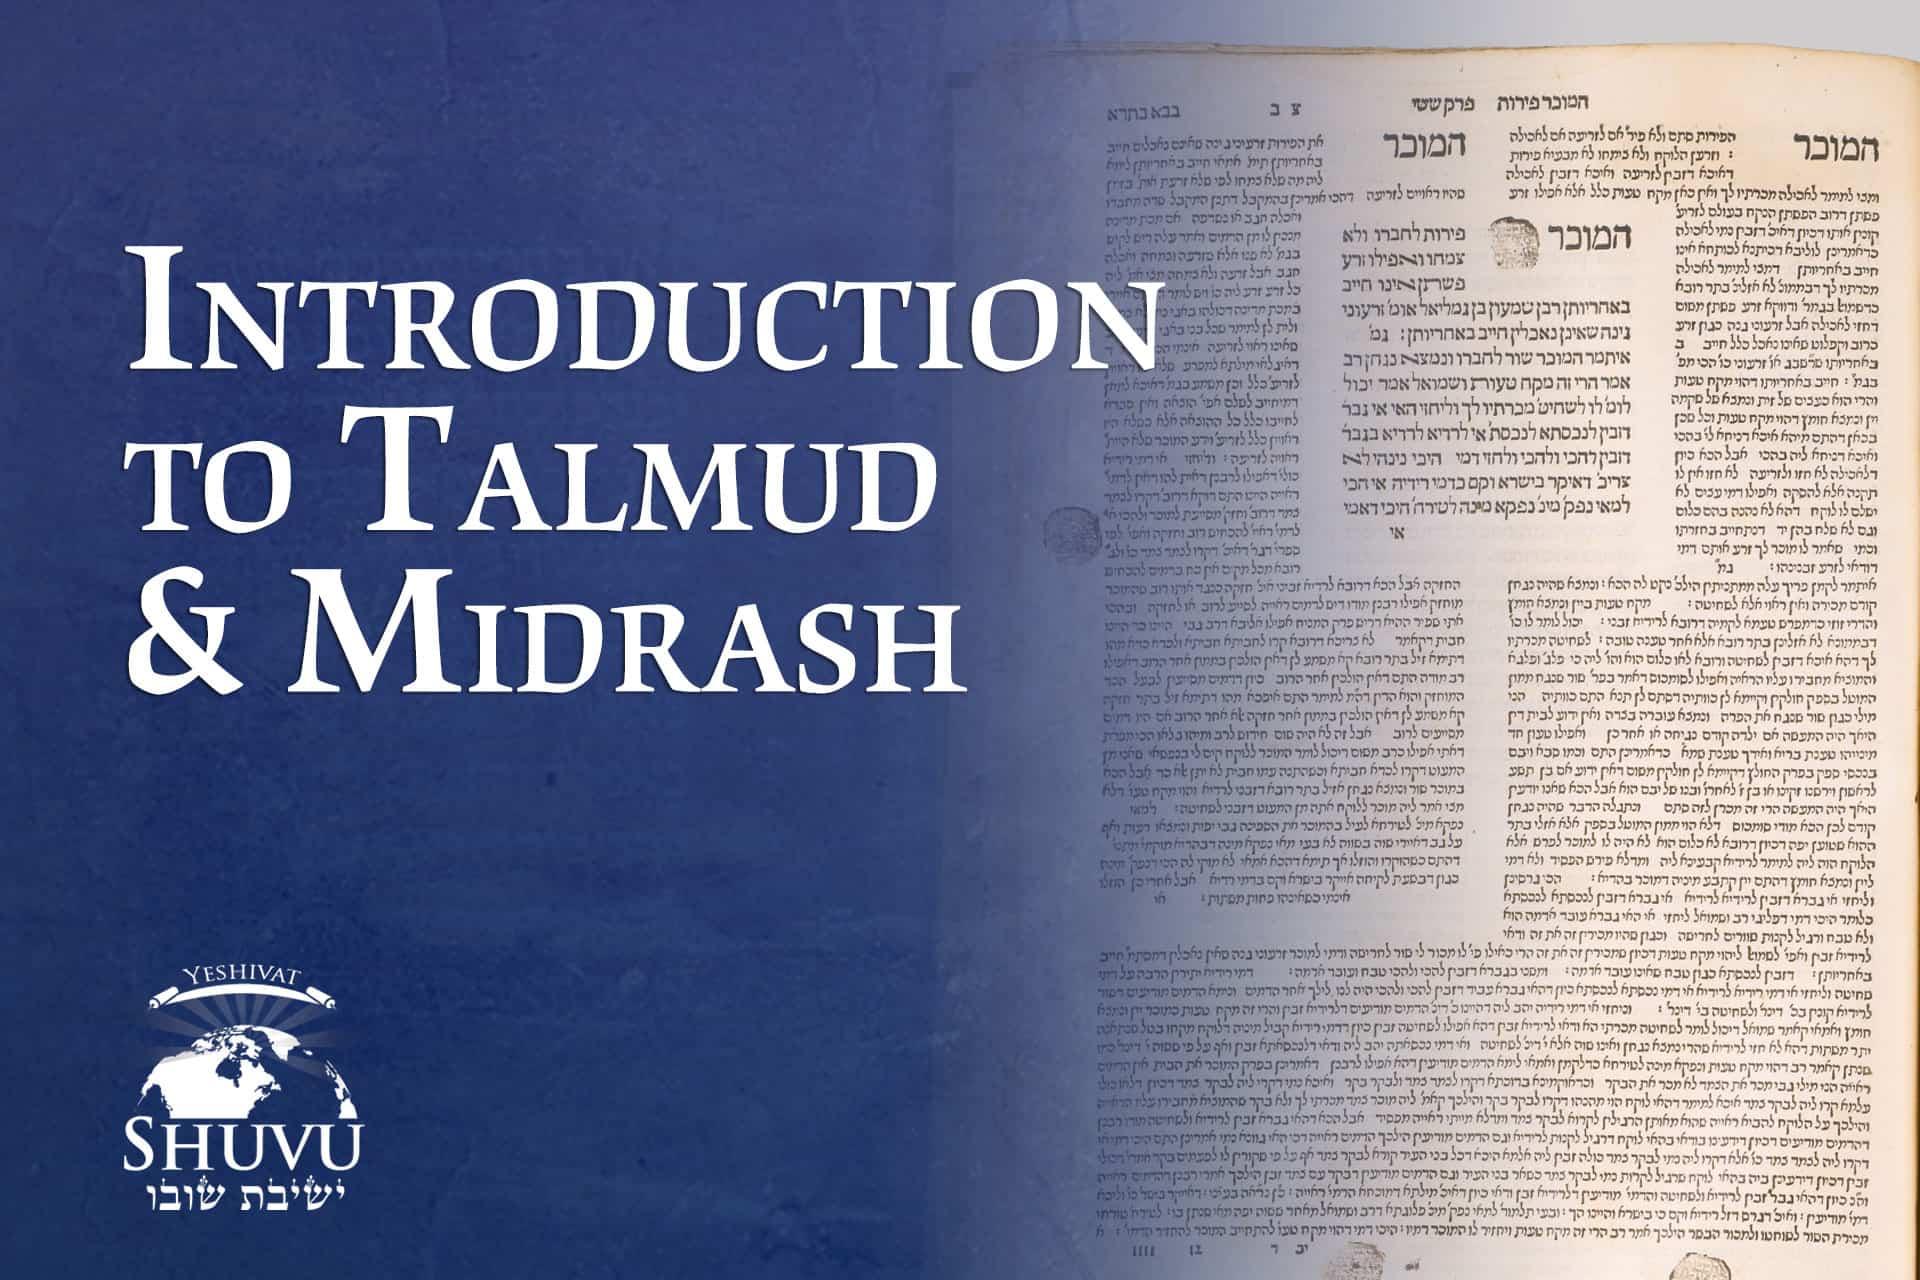 cover_yeshivat_shuvu_talmud_midrash_ENG